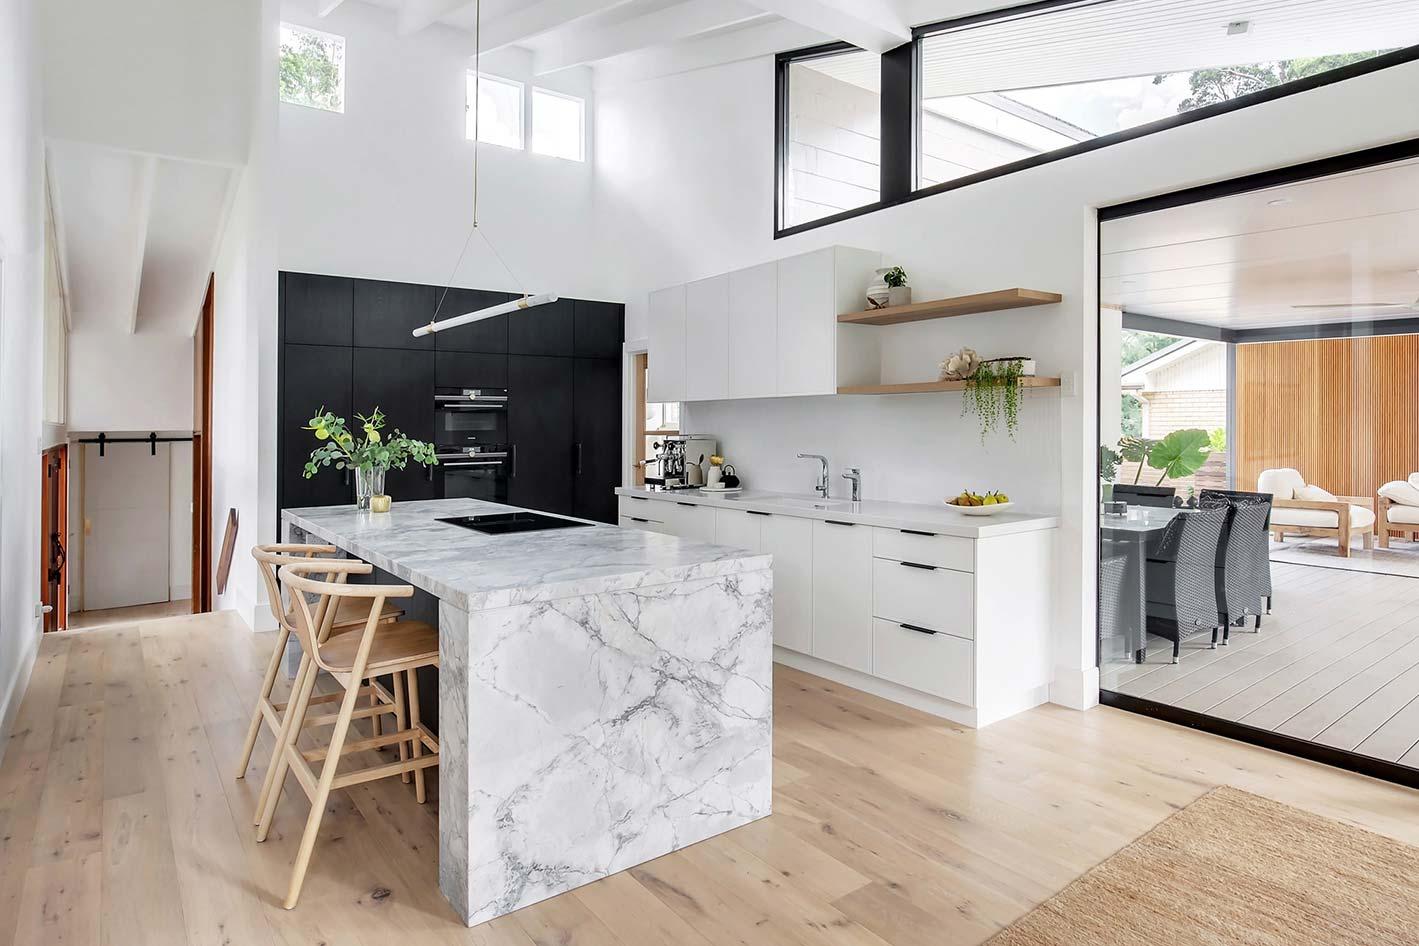 Cherrybrook Kitchen Projects | Dan Kitchens